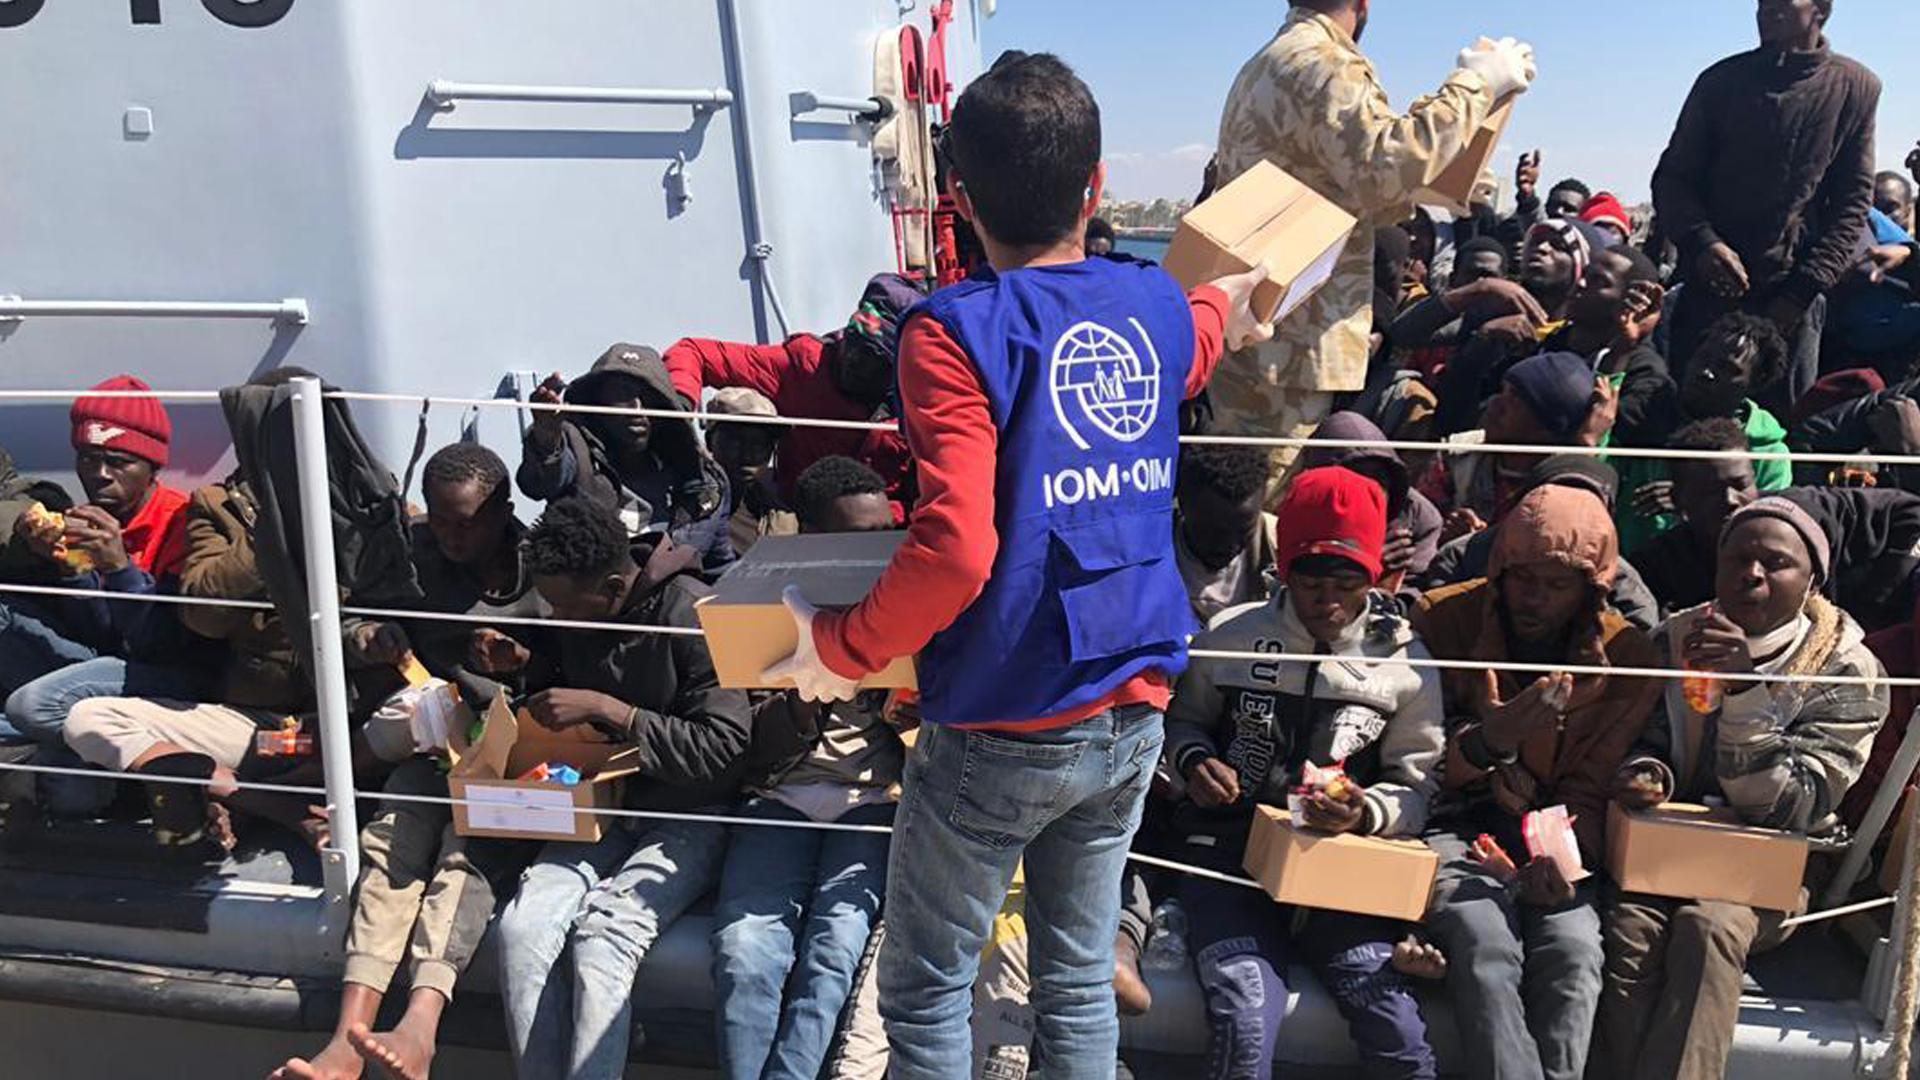 migranti OIM - Decreti Salvini